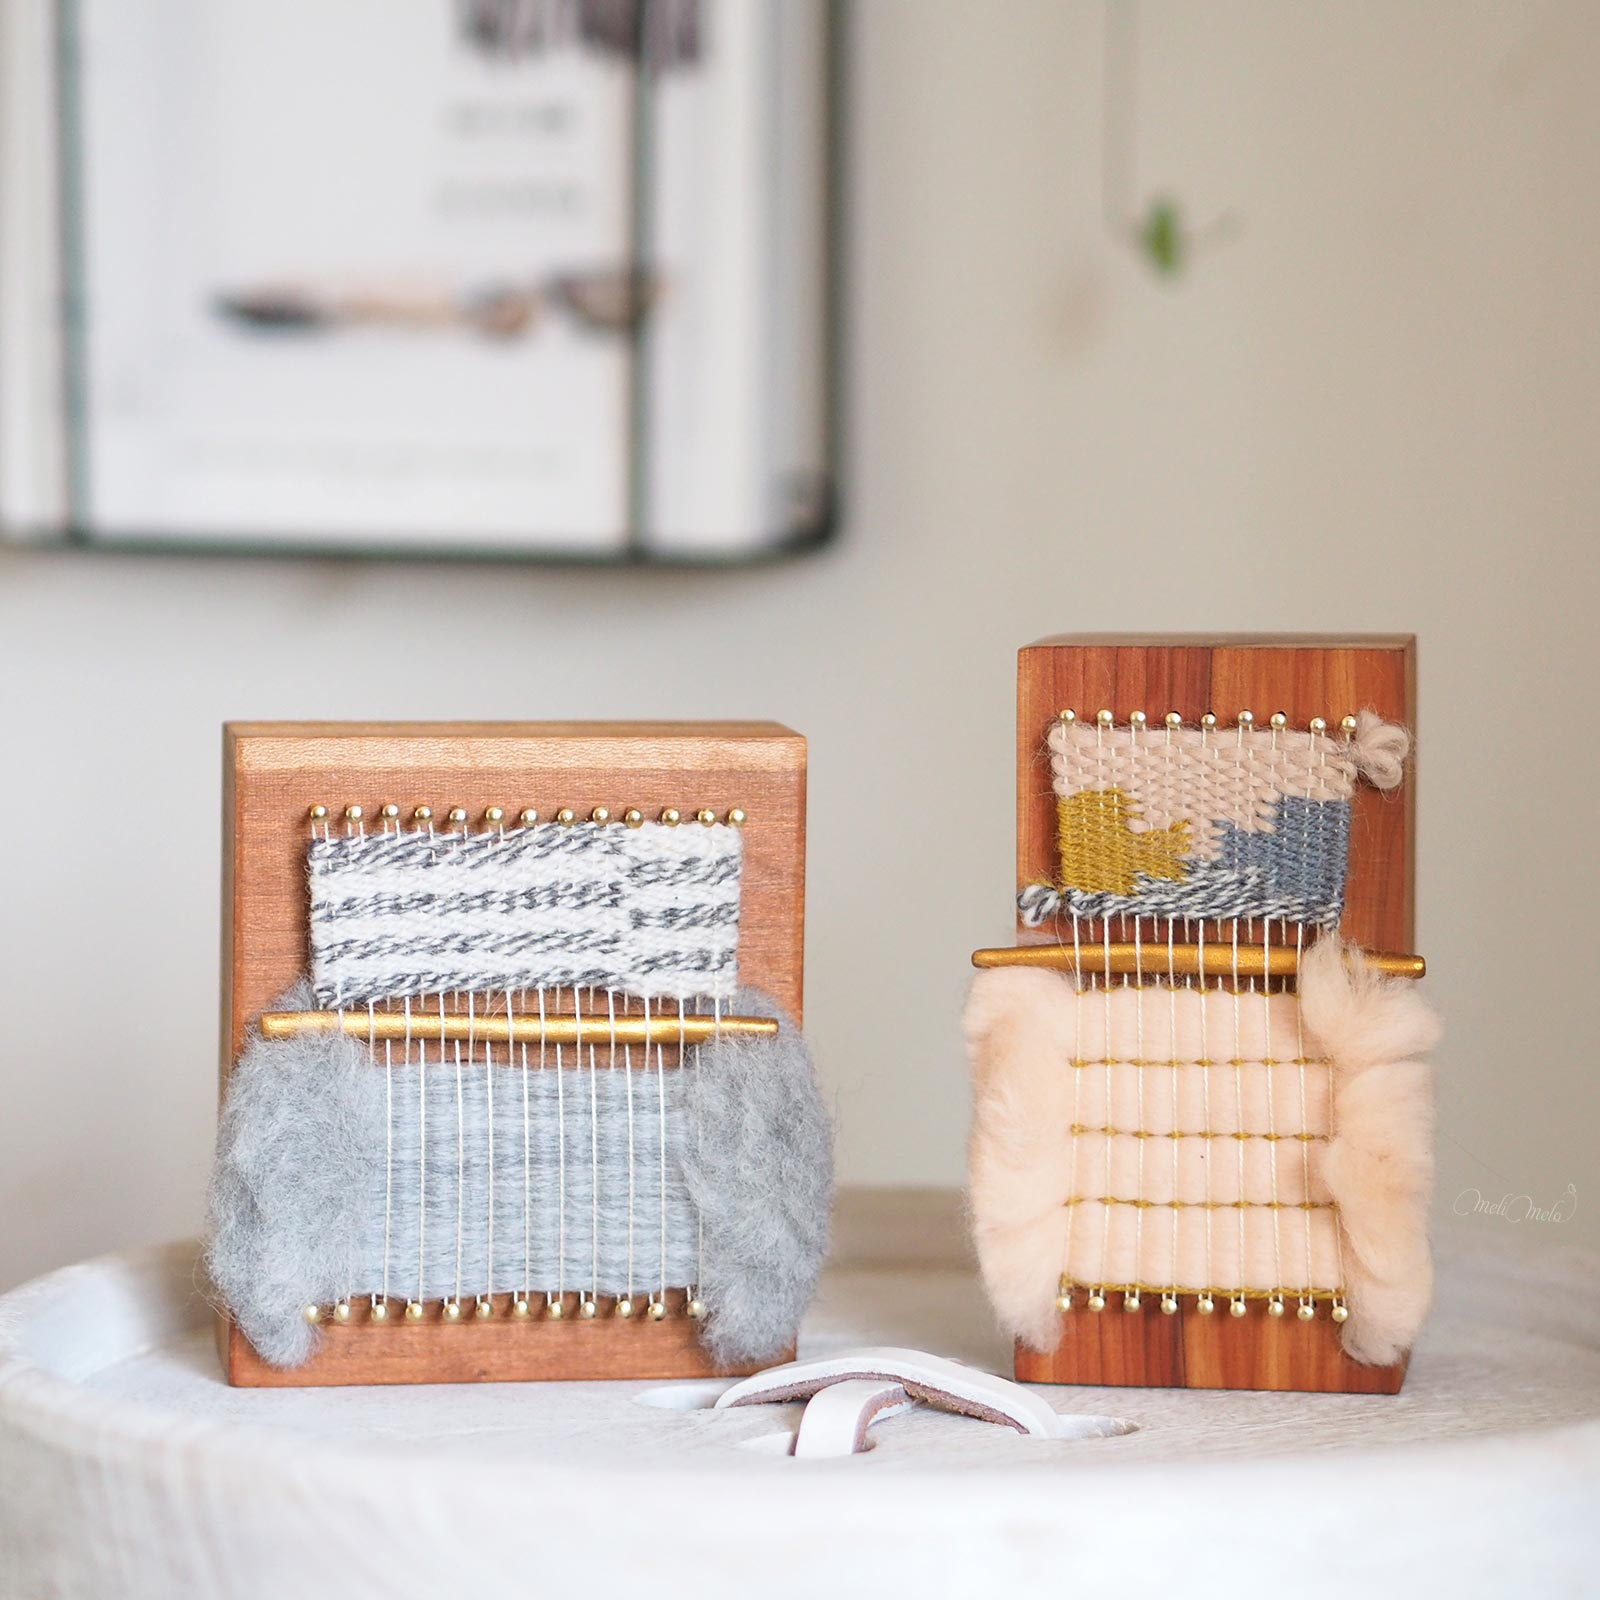 weaving mini loom blocks wood fiberart twentytwowest give away koel magazine